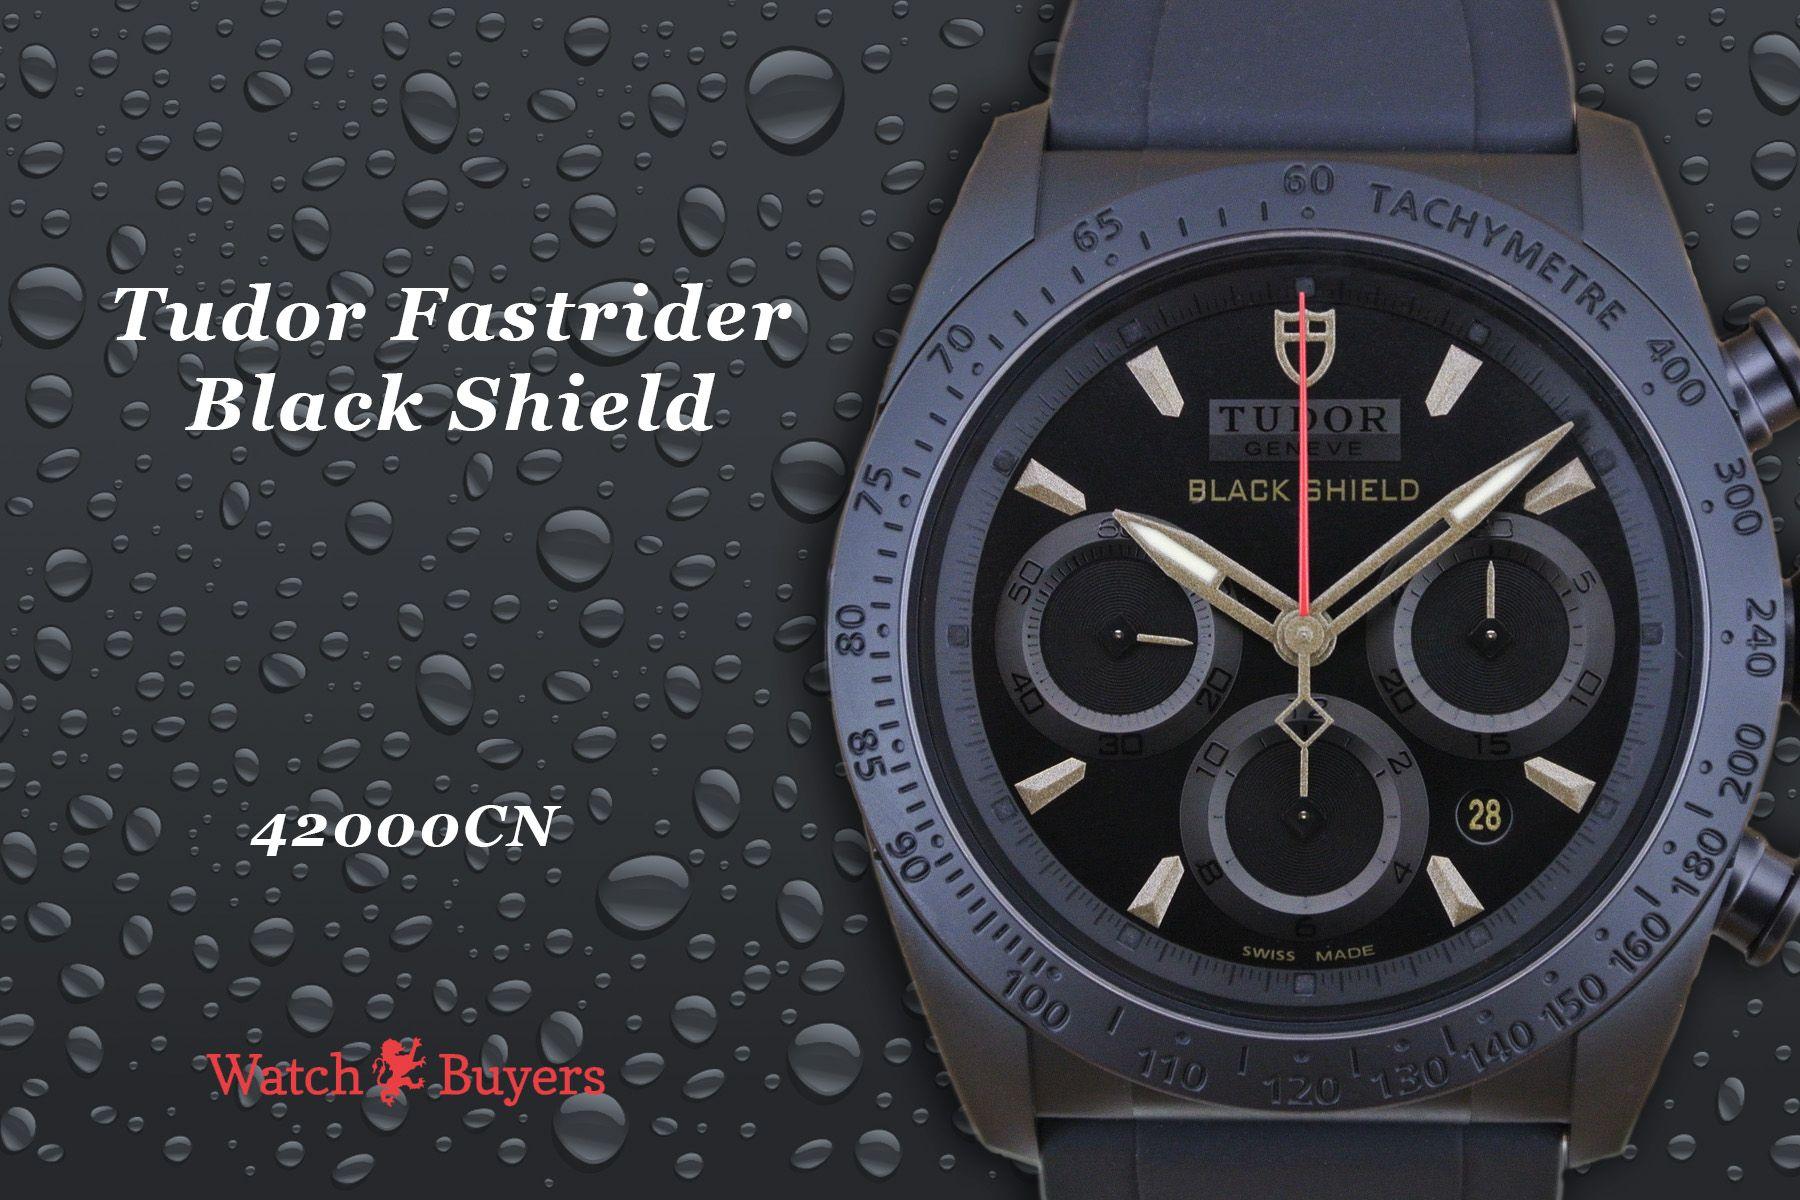 Tudor Fast Rider Black Shield